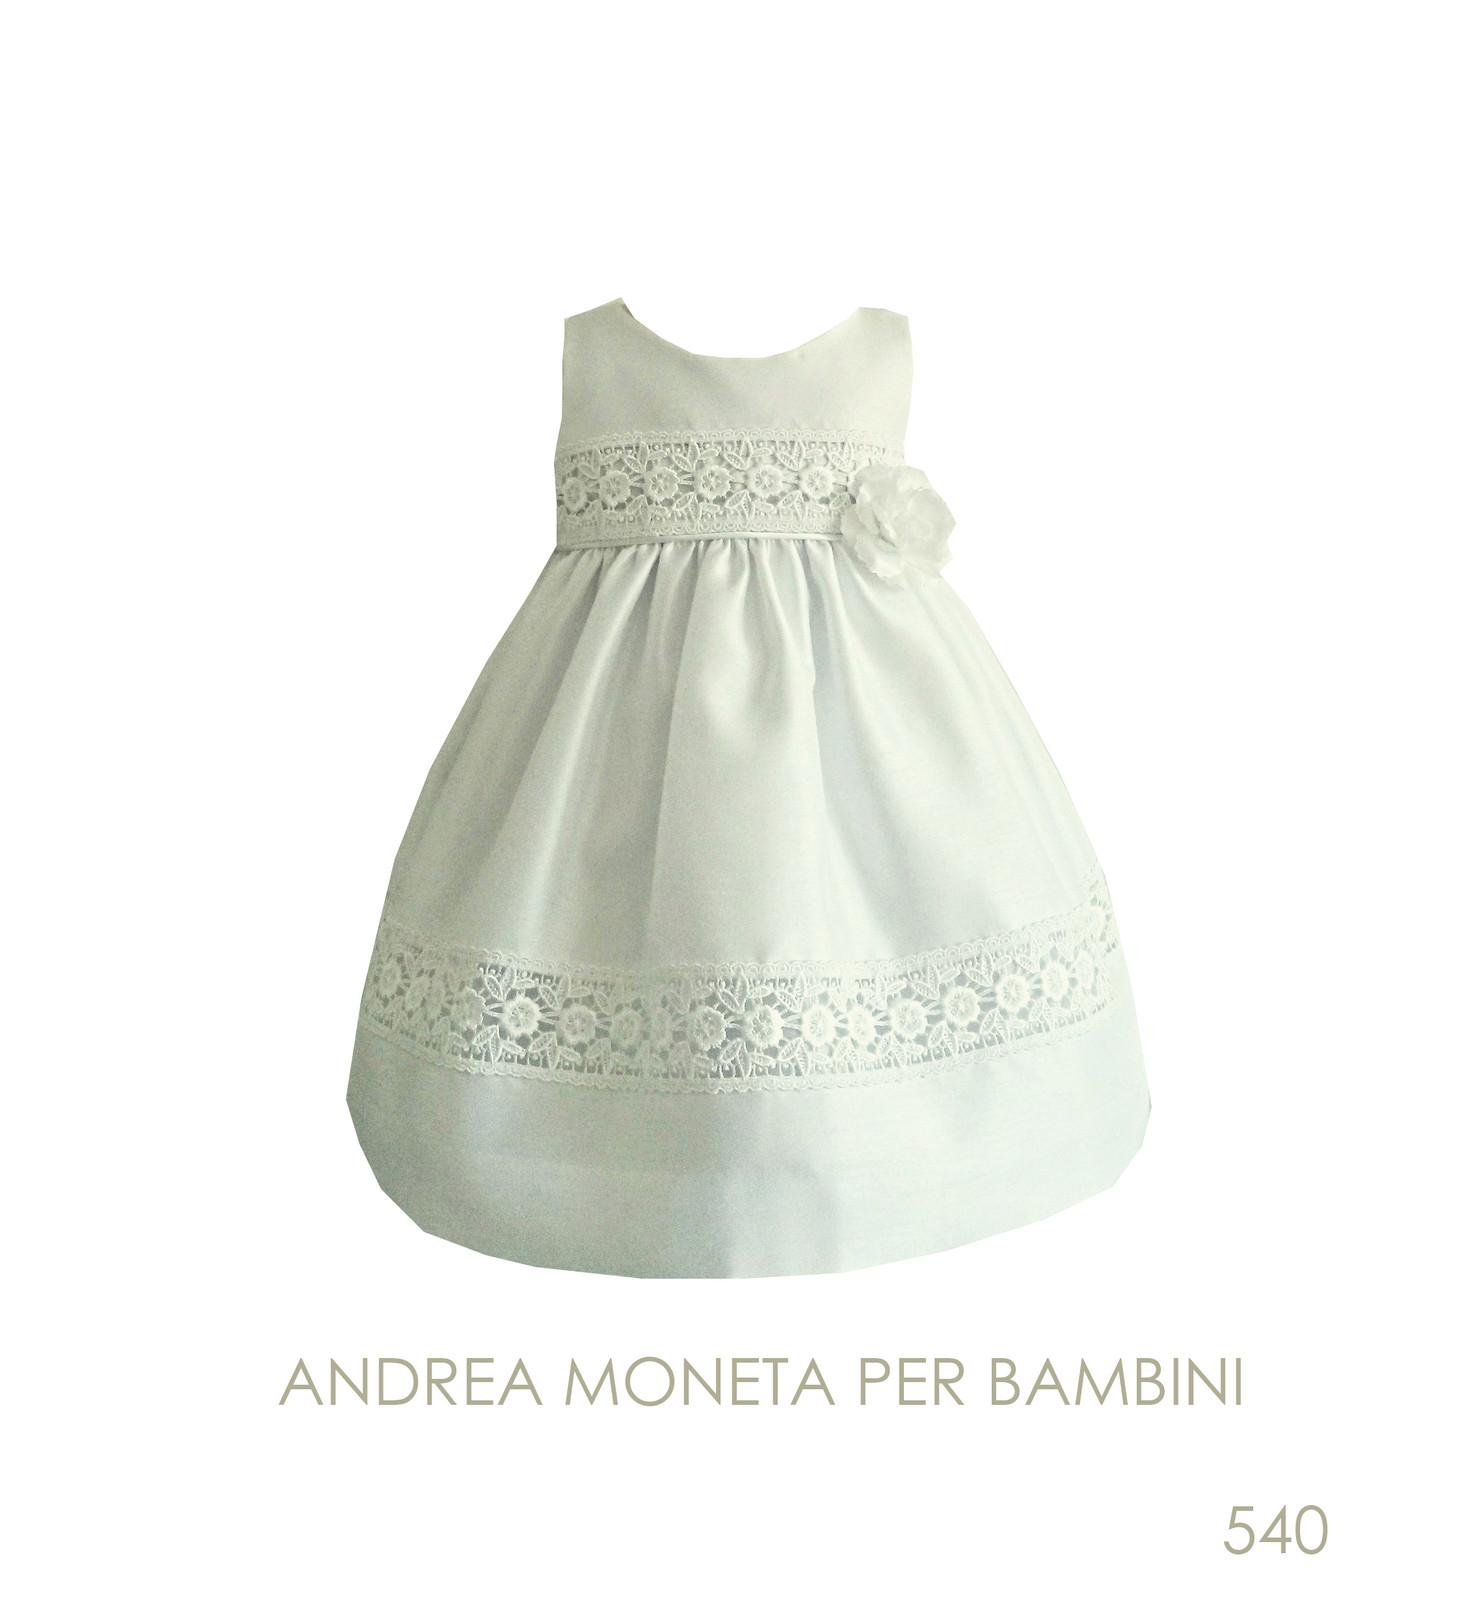 e0411ab85 ... para bebe bautismo fiesta · 545 VESTIDO BAUTISMO FIESTA NIÑA ANDREA  ·  821.jpg · 540 FB vestido blanco andrea moneta baut ...